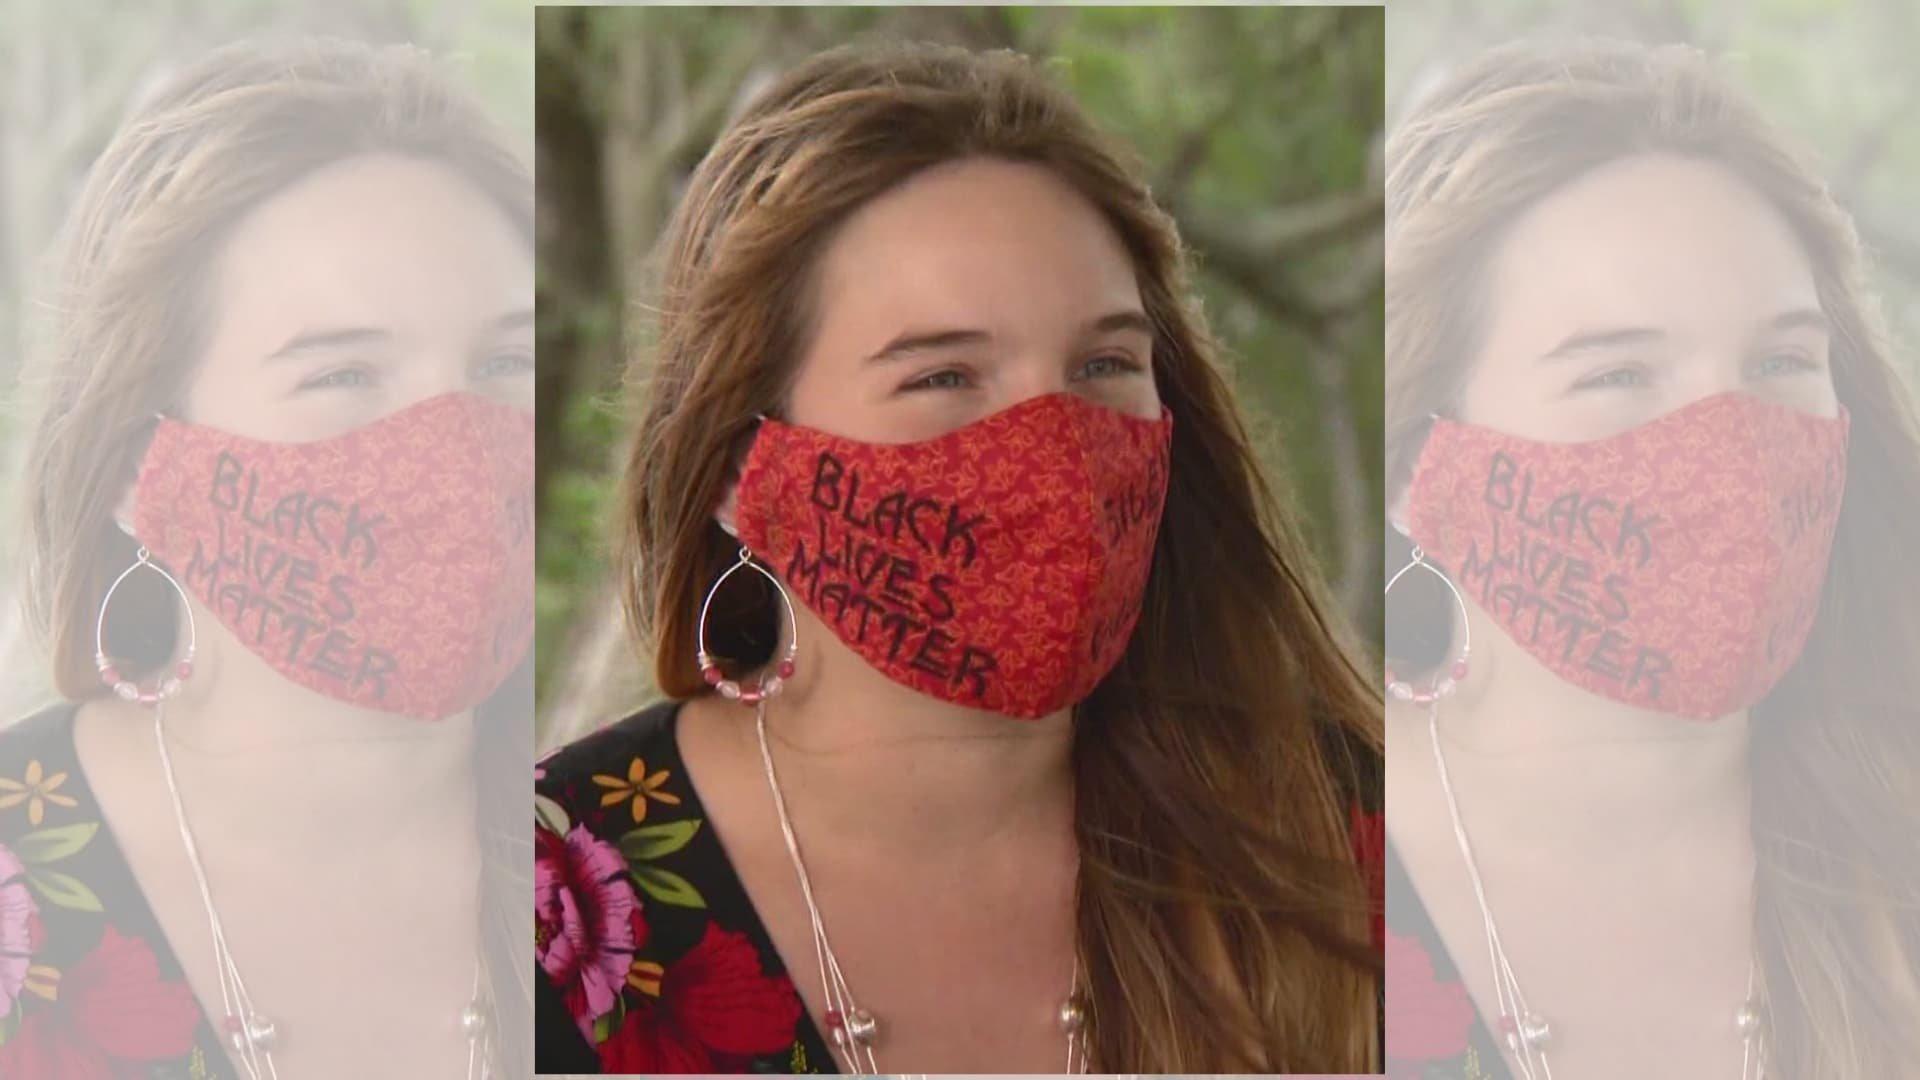 Texas teacher fired for refusing to stop wearing Black Lives Matter mask